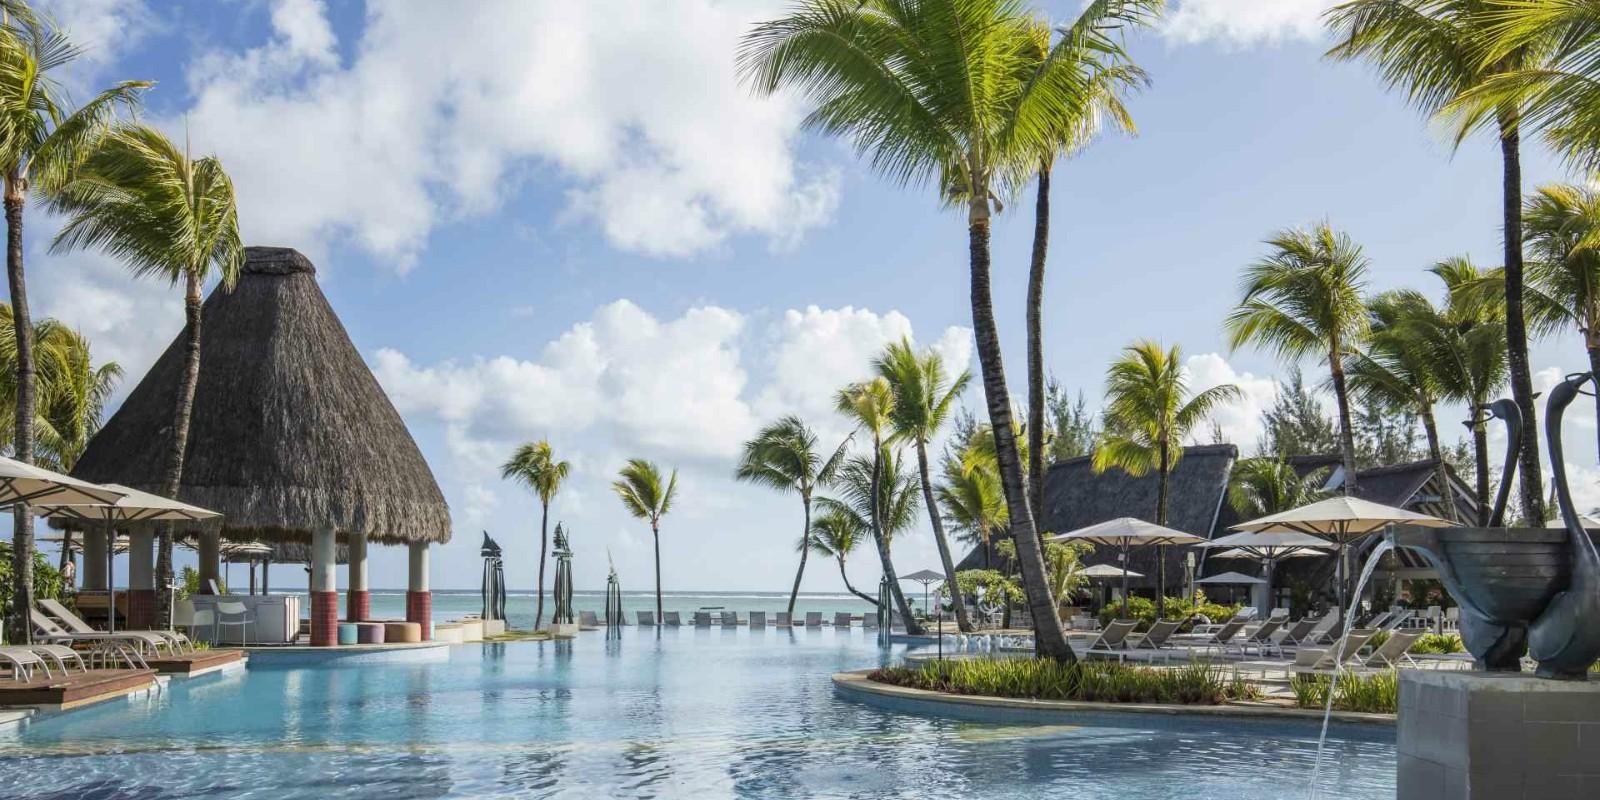 Ambre resort Mauritius Pool